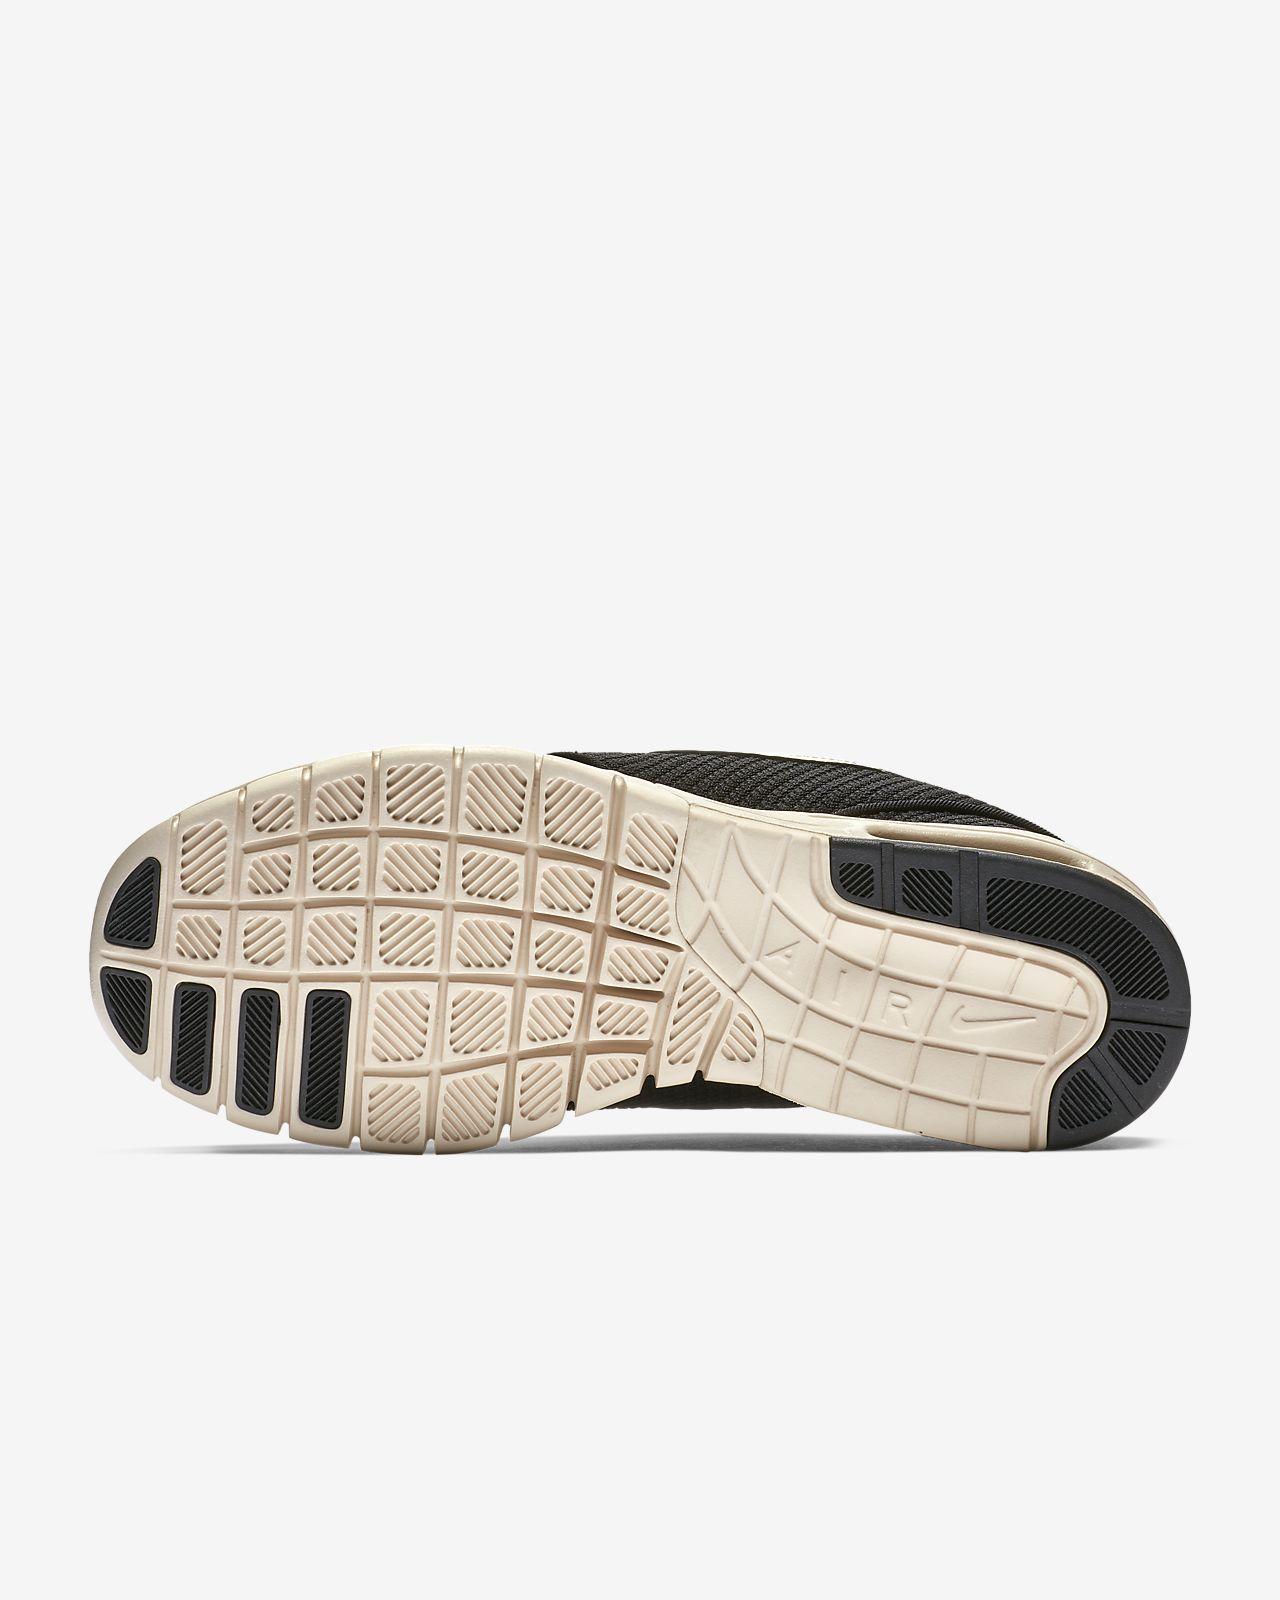 2ffc5b6beeae Nike SB Stefan Janoski Max Skate Shoe. Nike.com